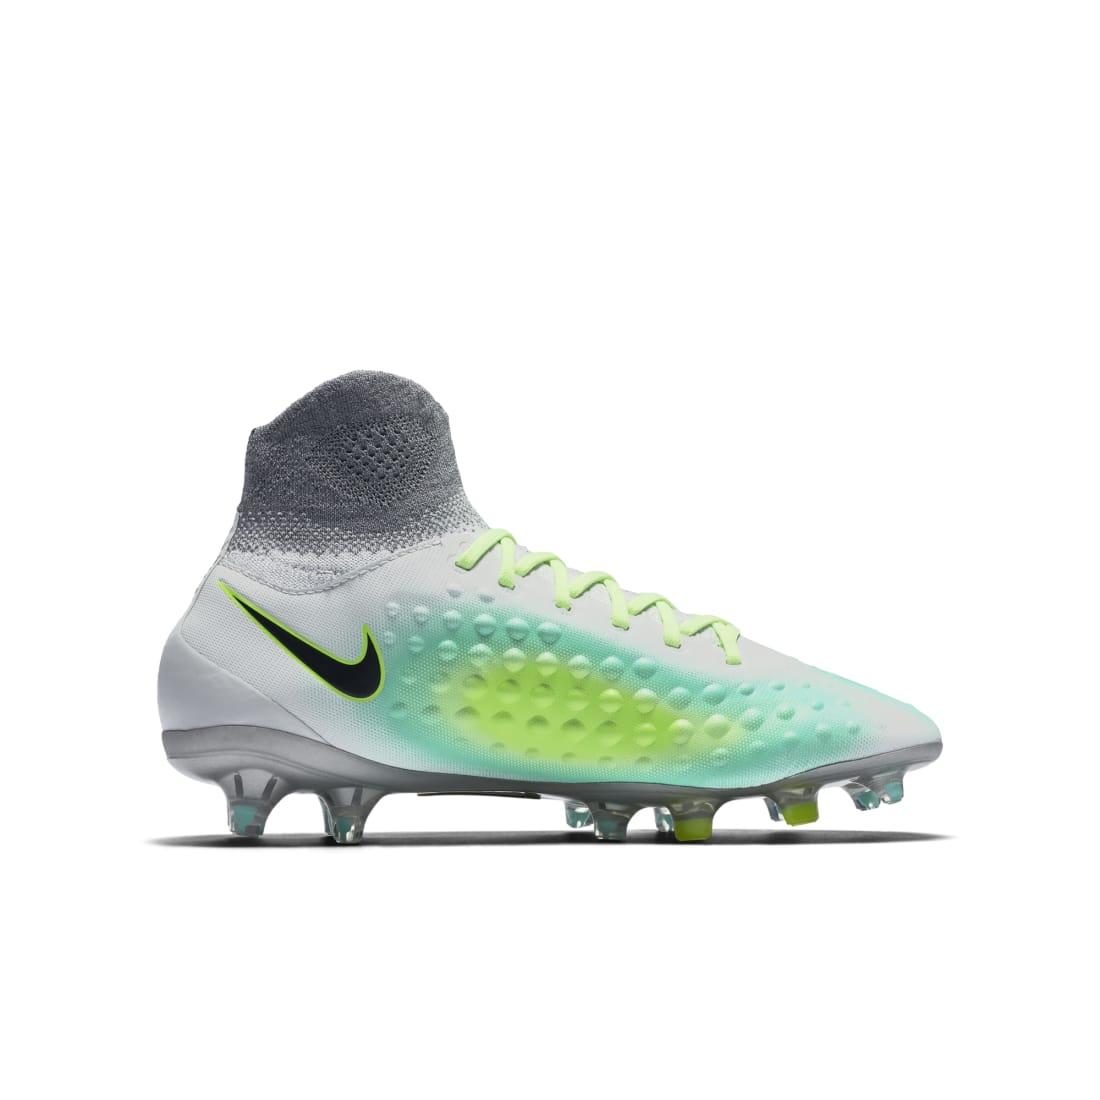 Nike Magista Obra 2 FG Pure Platinum Green